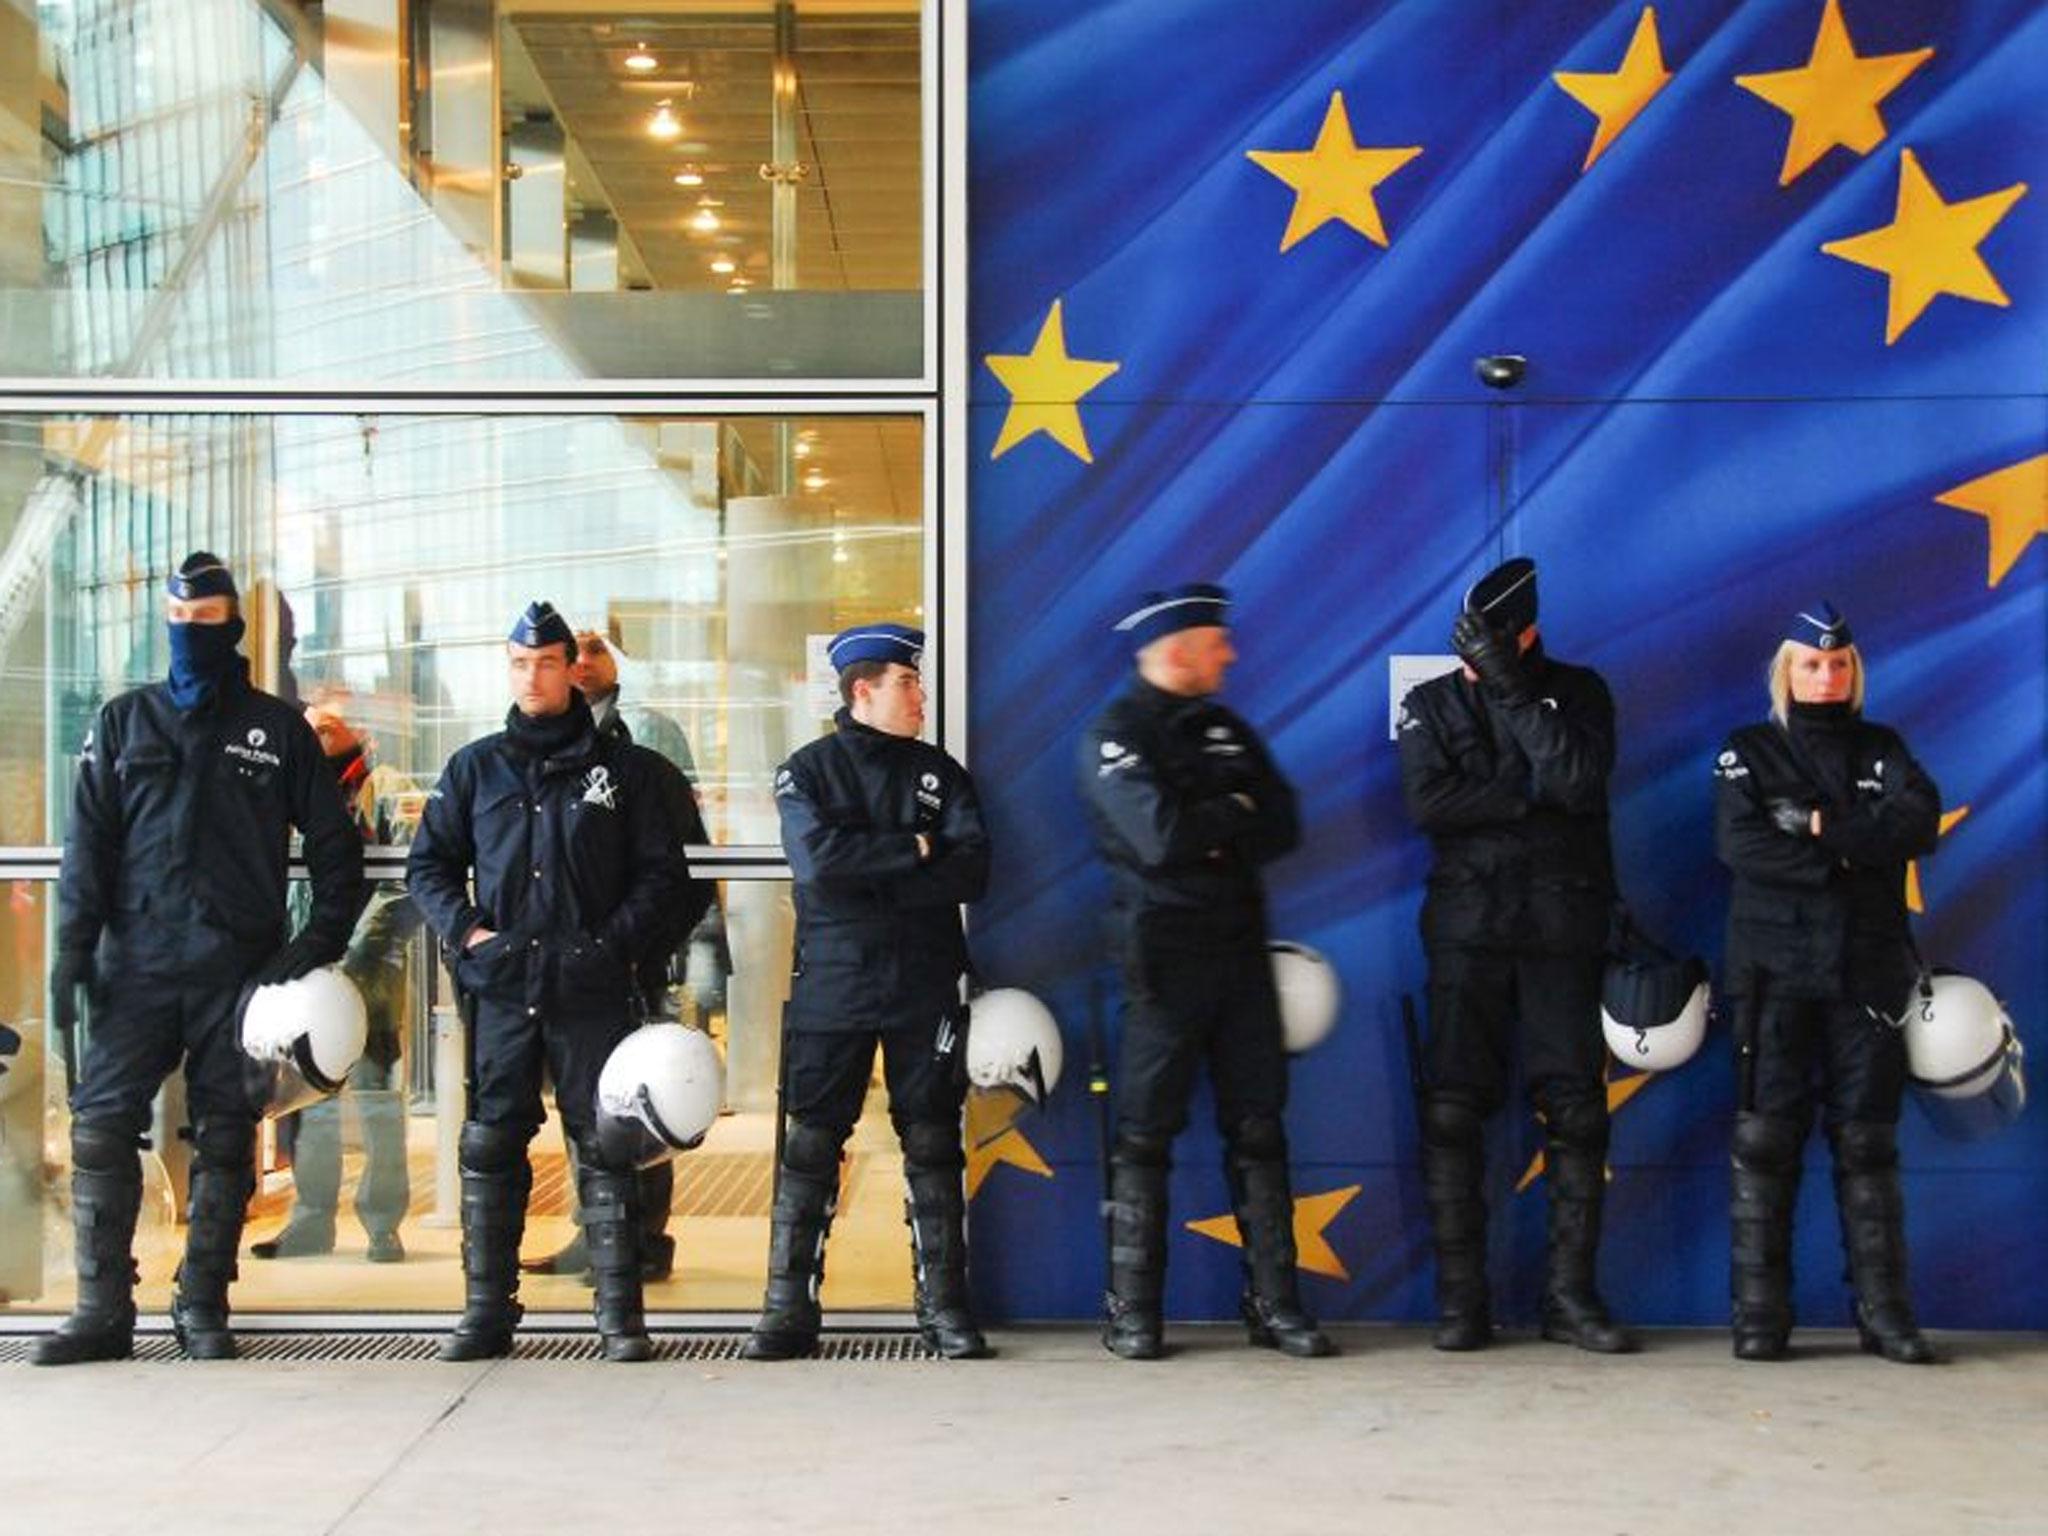 Euro press image